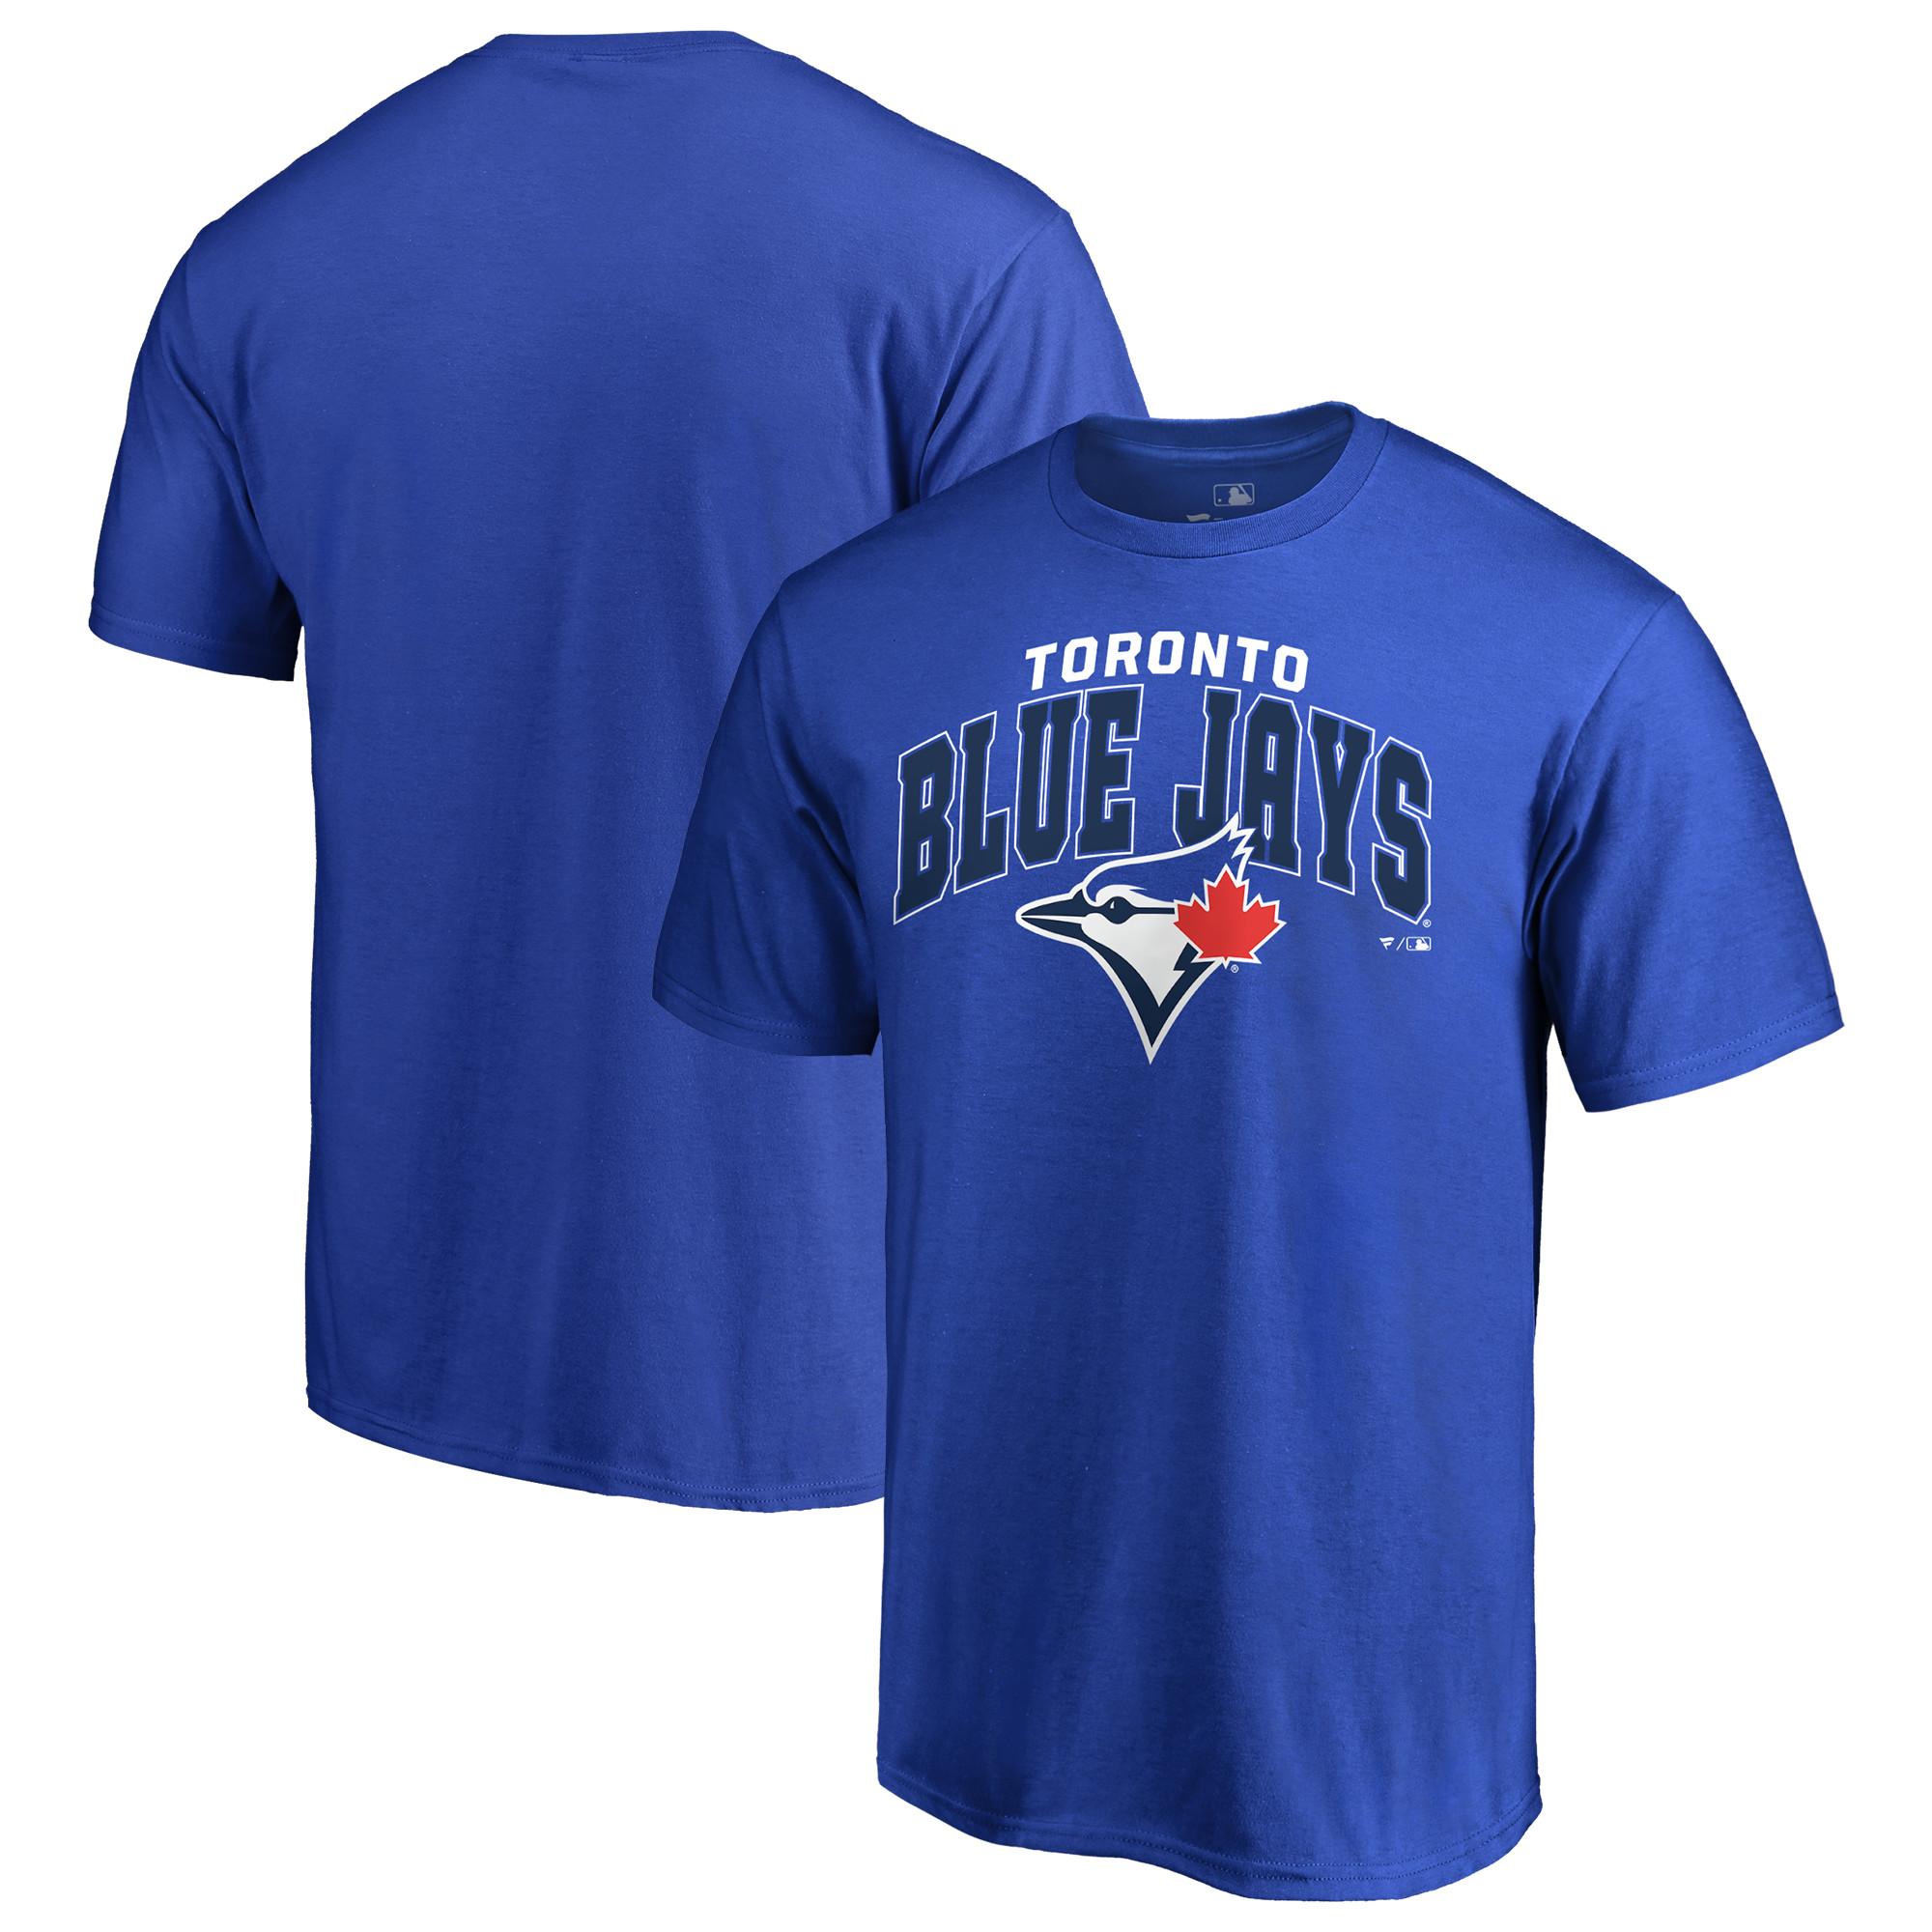 Toronto Blue Jays Fanatics Branded T-Shirt - Royal